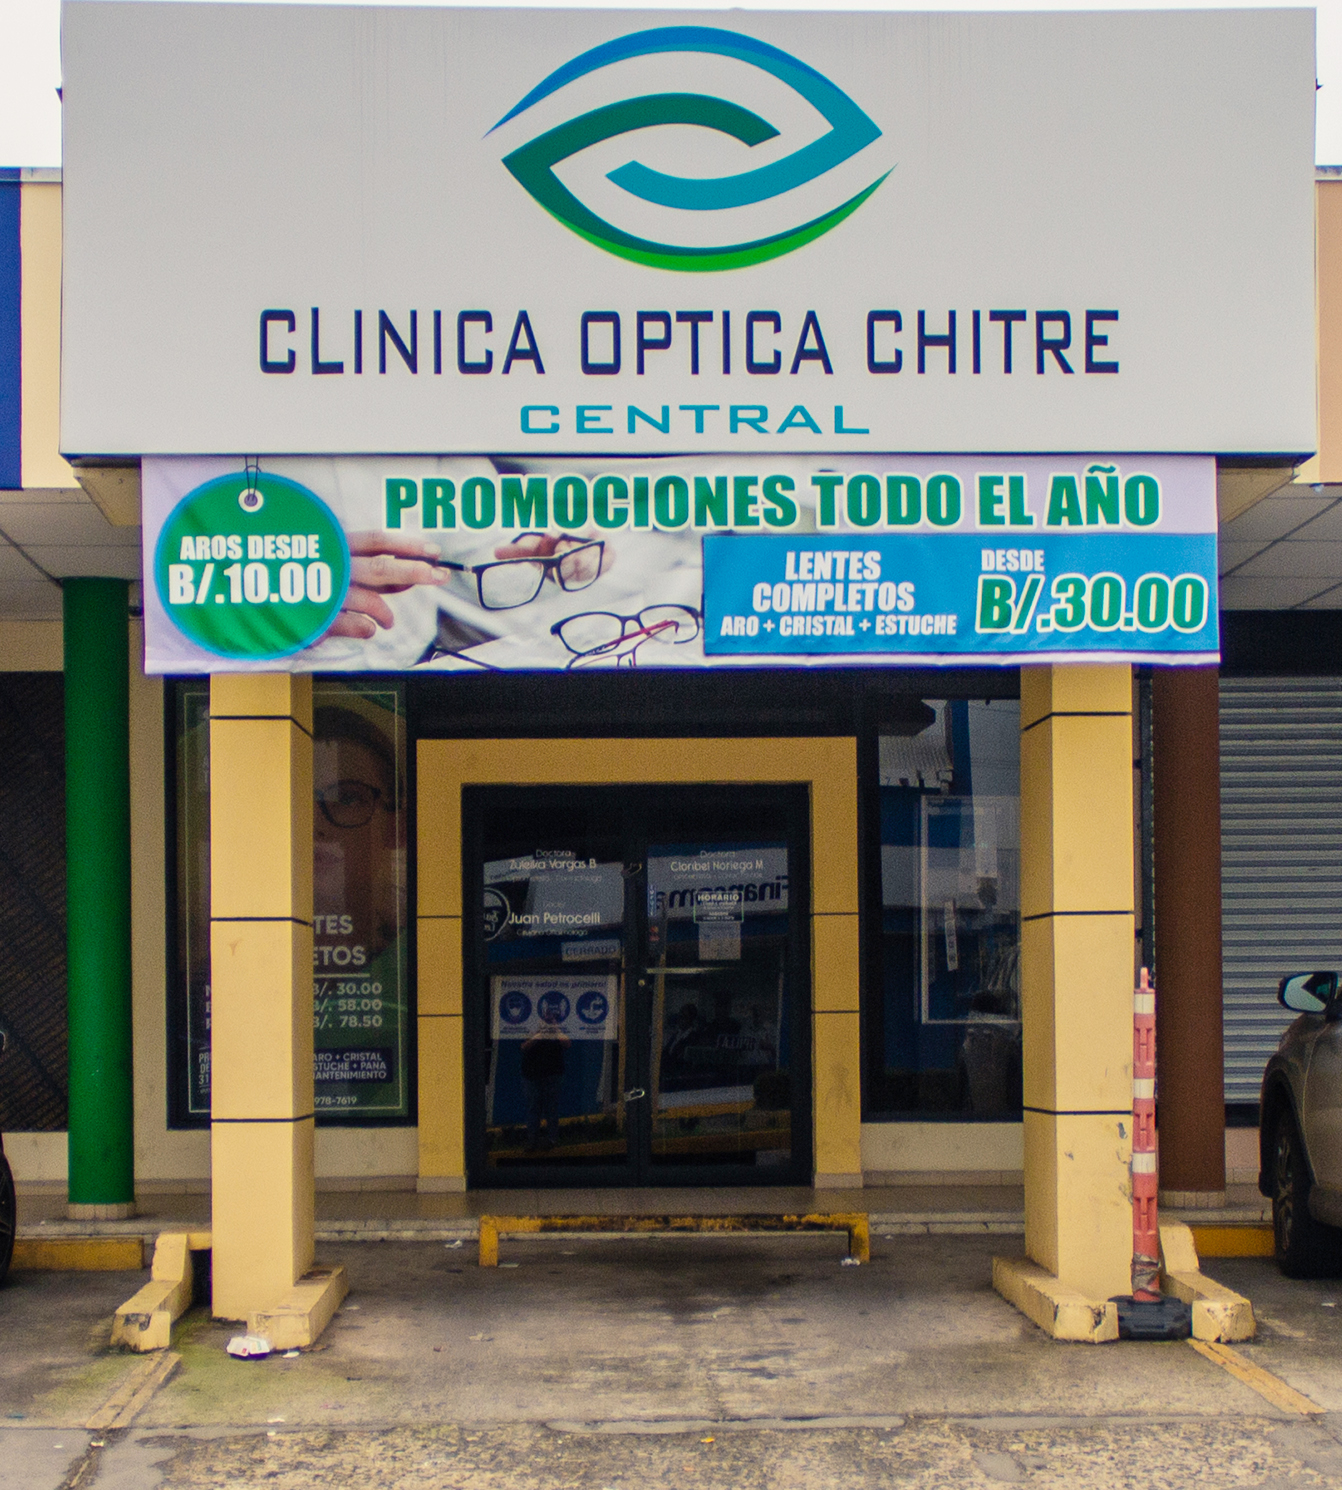 Clínica Óptica Chitre Paseo Enrique G